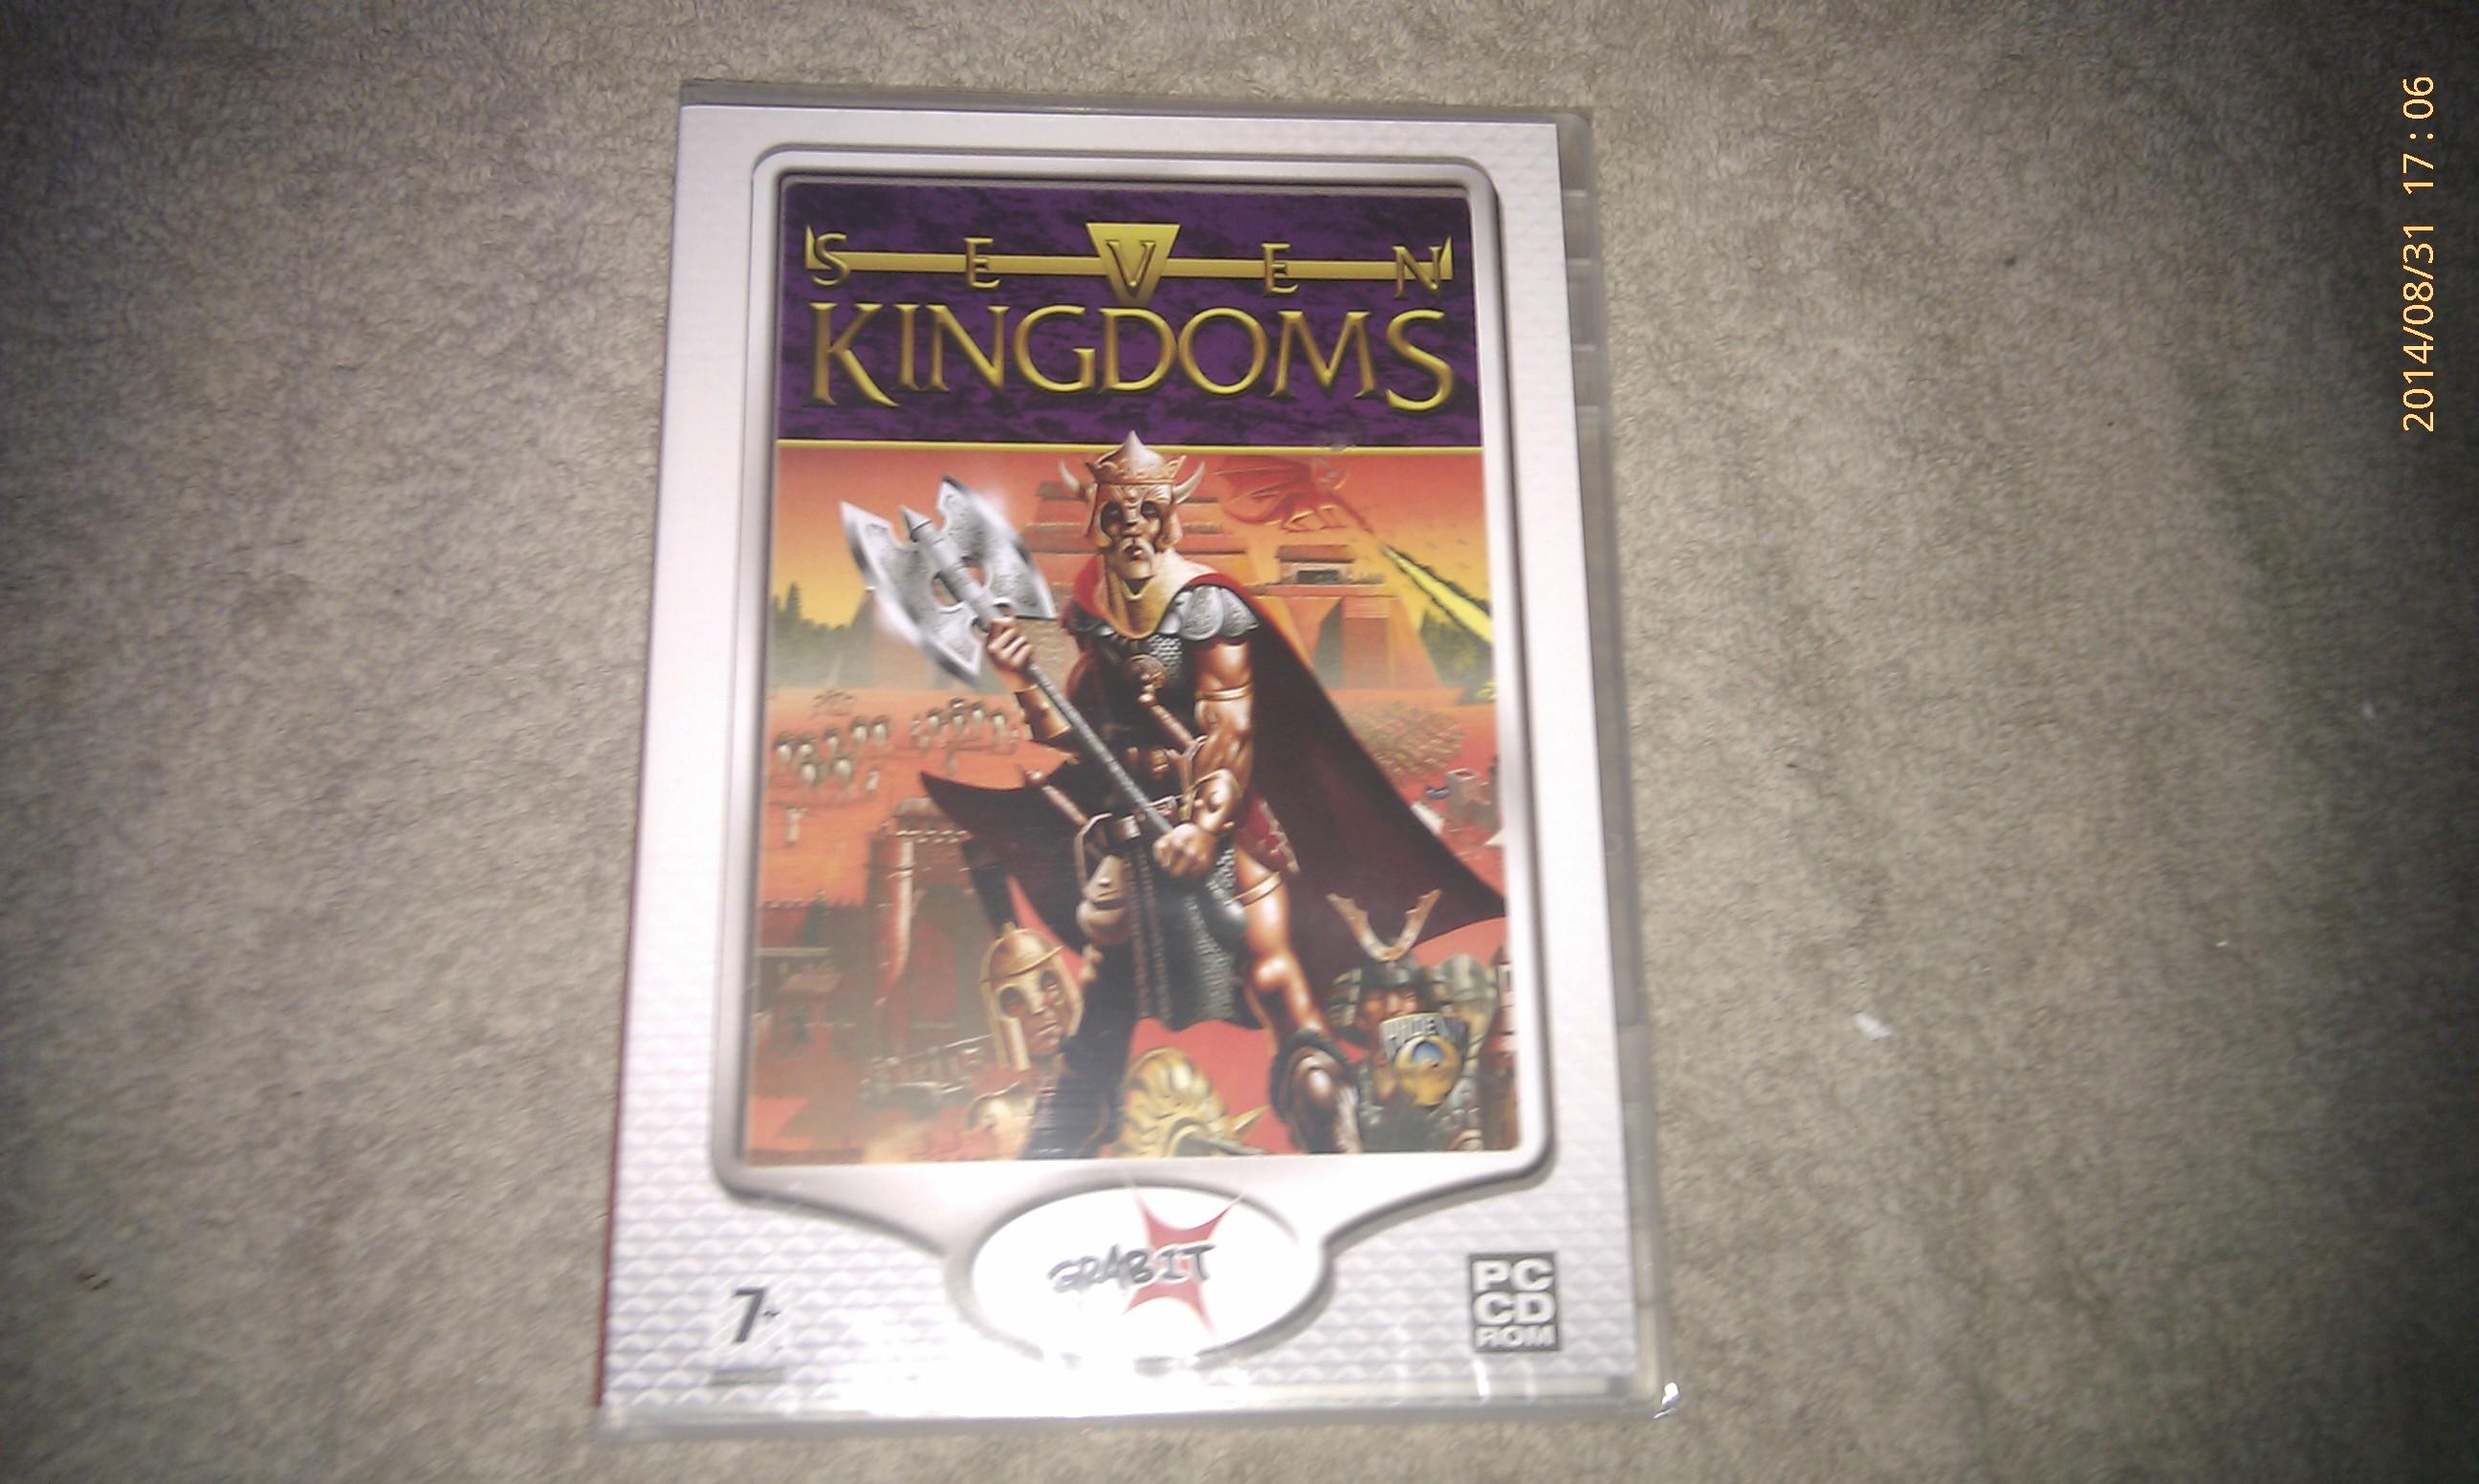 Seven Kingdoms PC Games